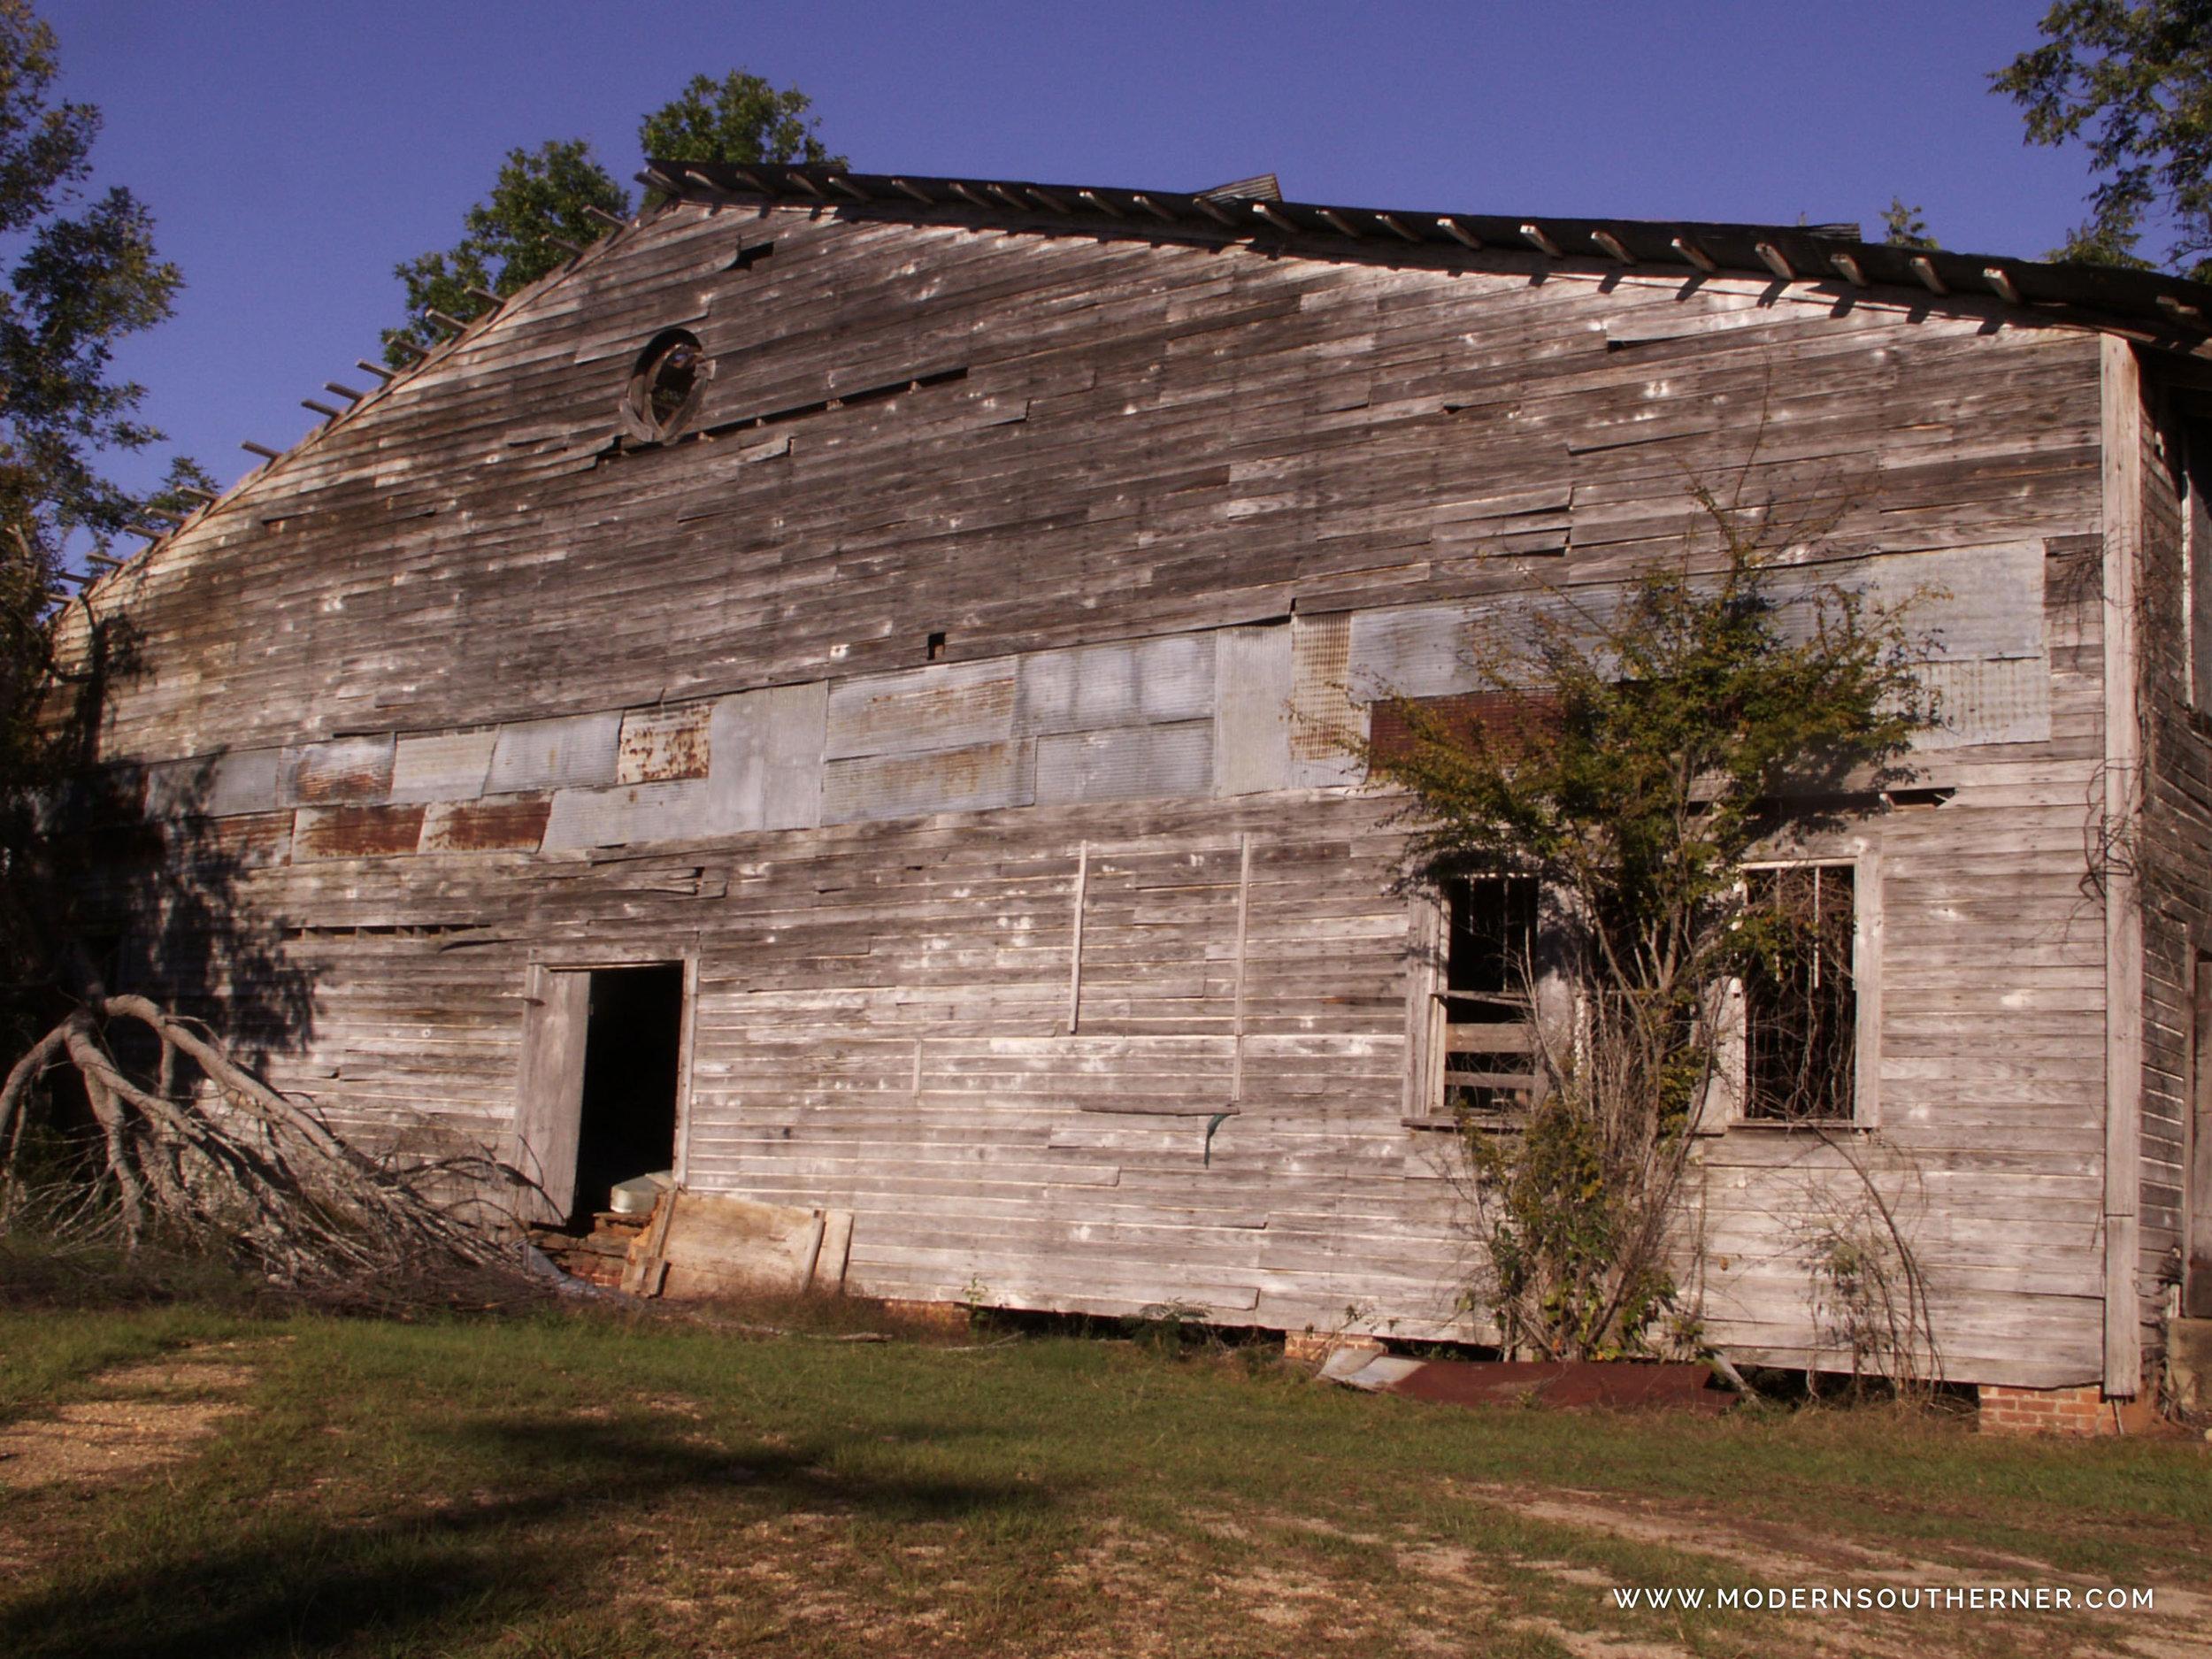 Abandoned Building in Louisiana